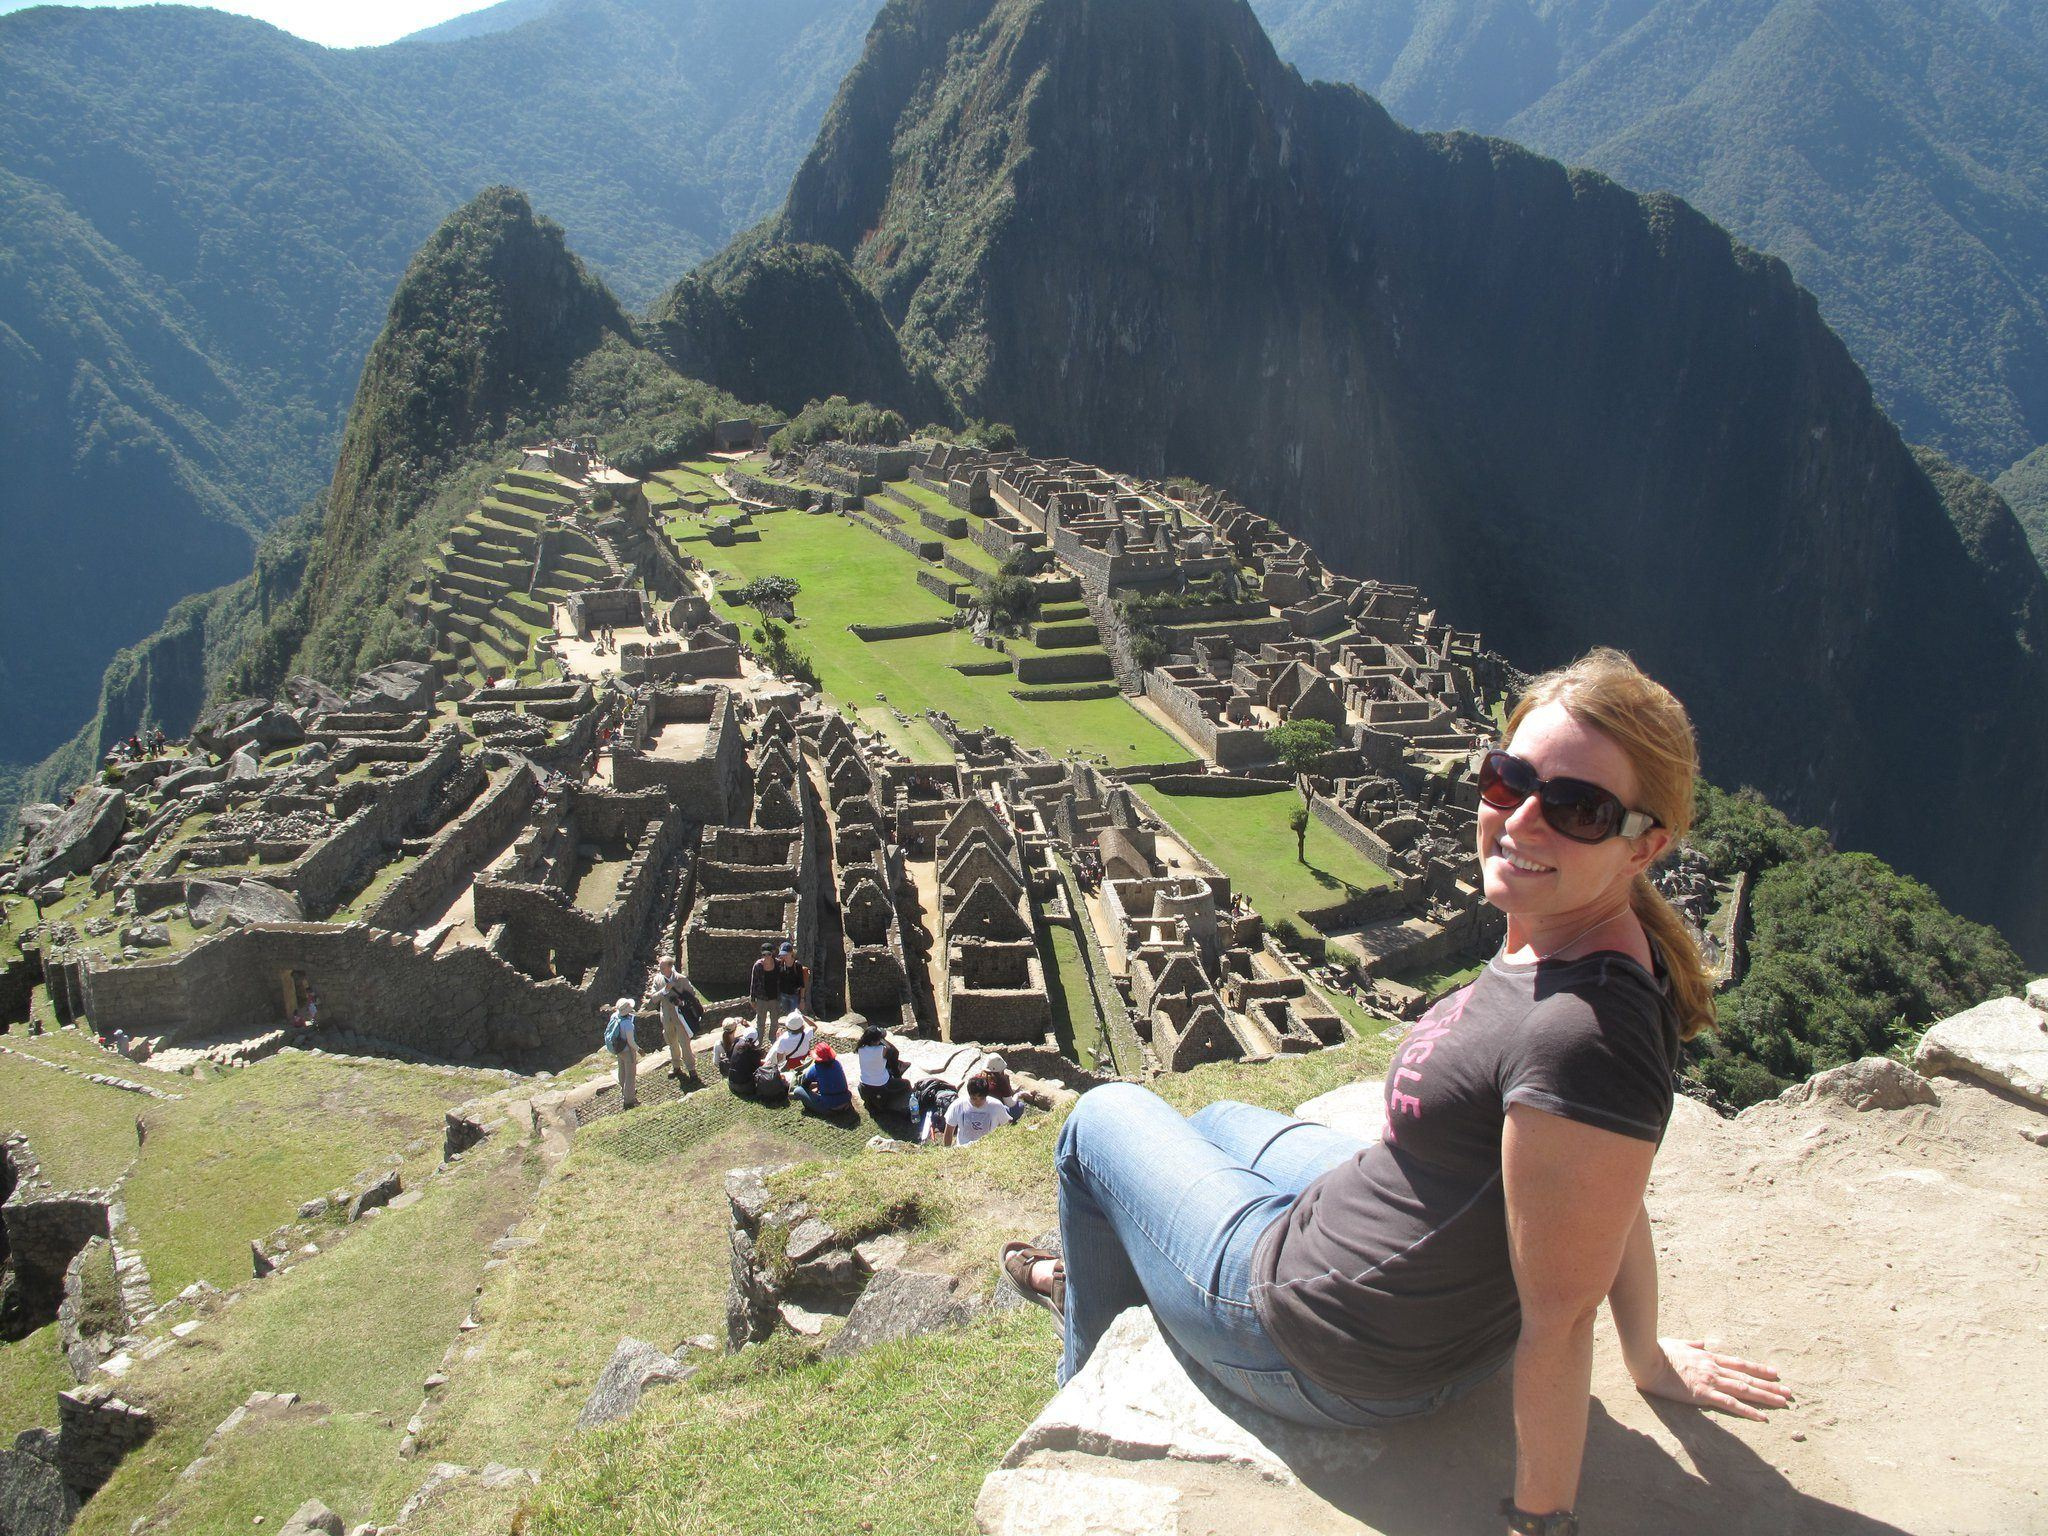 Sarah at Machu Pichu with a Global Journeys group.